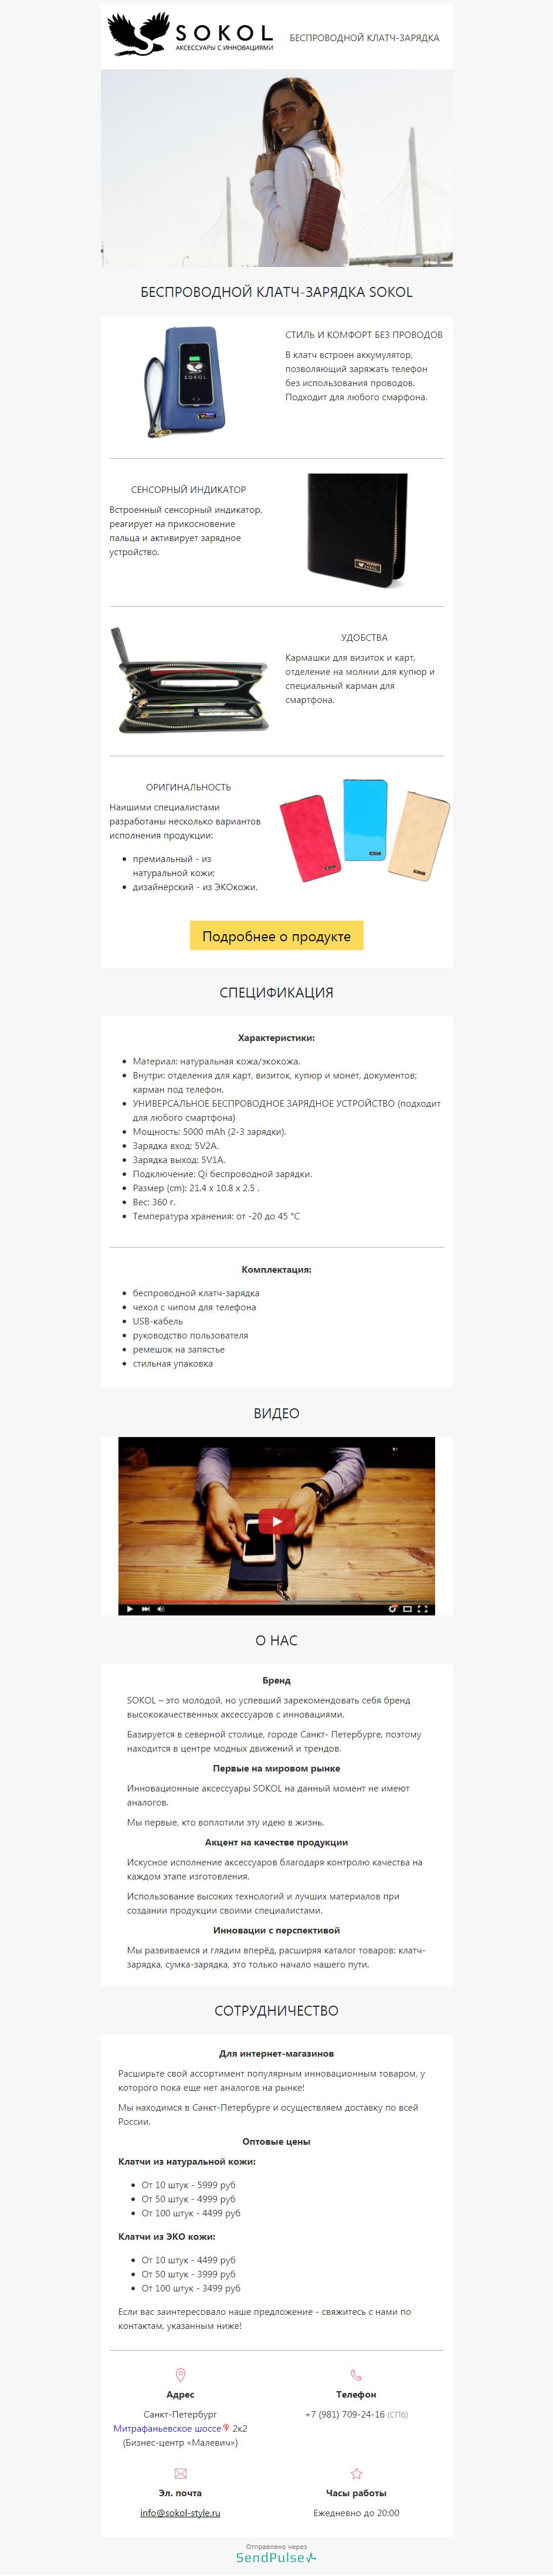 Настройка и ведение Я.Директ, Adwords, Я.Маркет, E-mail marketing для sokol-style.ru